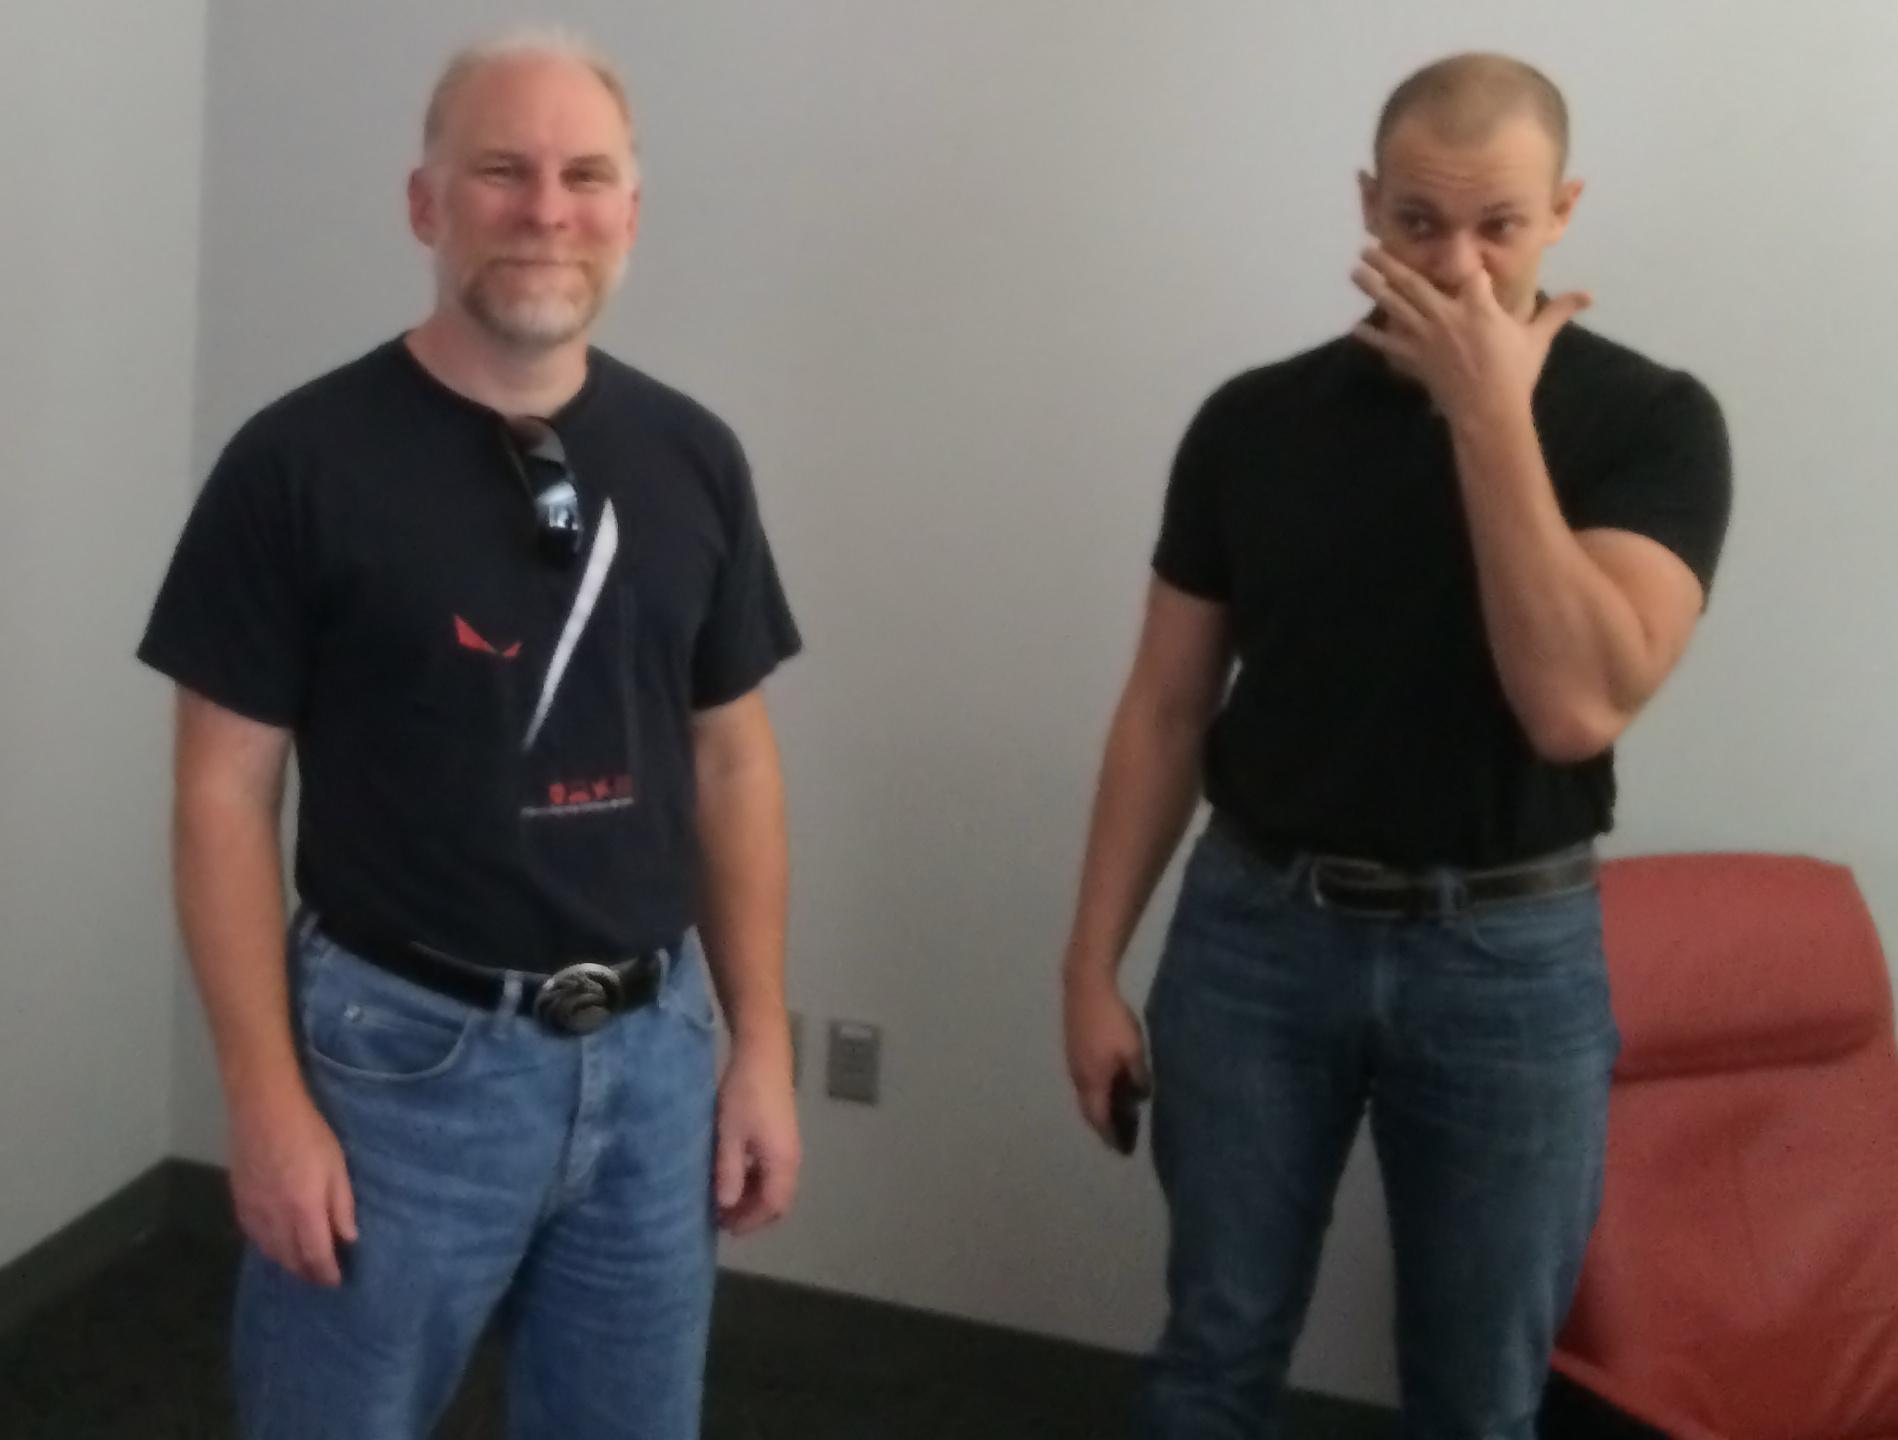 Gearbox Homeworld Team - Patrick Dupree and Jonathan Fawcett Pic